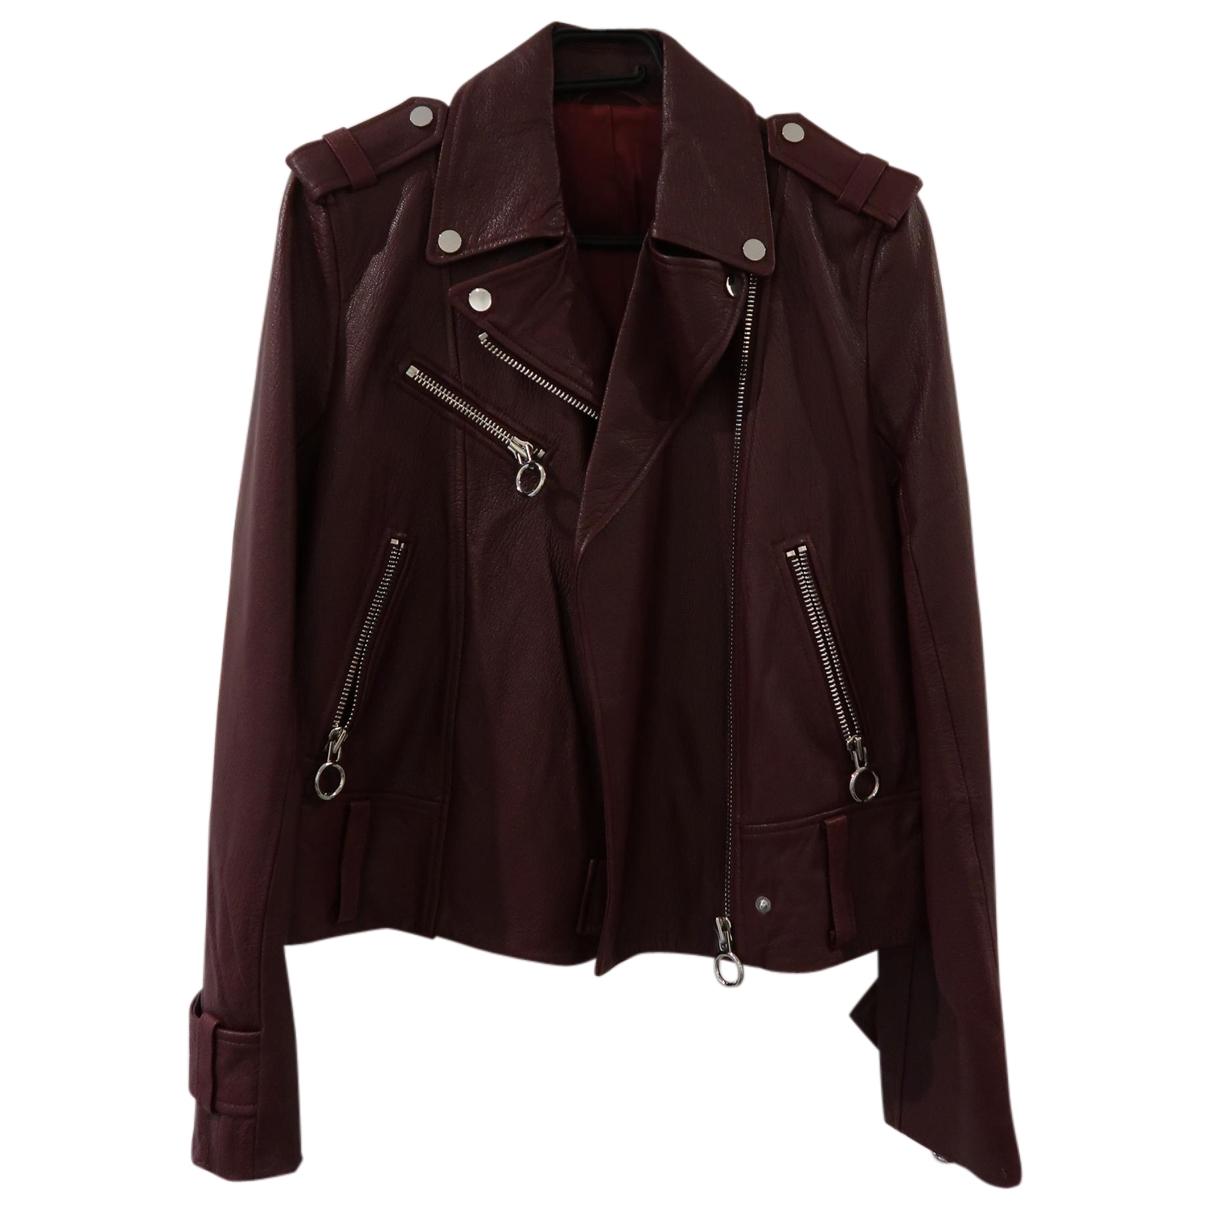 Mo&co \N Burgundy Leather jacket for Women XL International